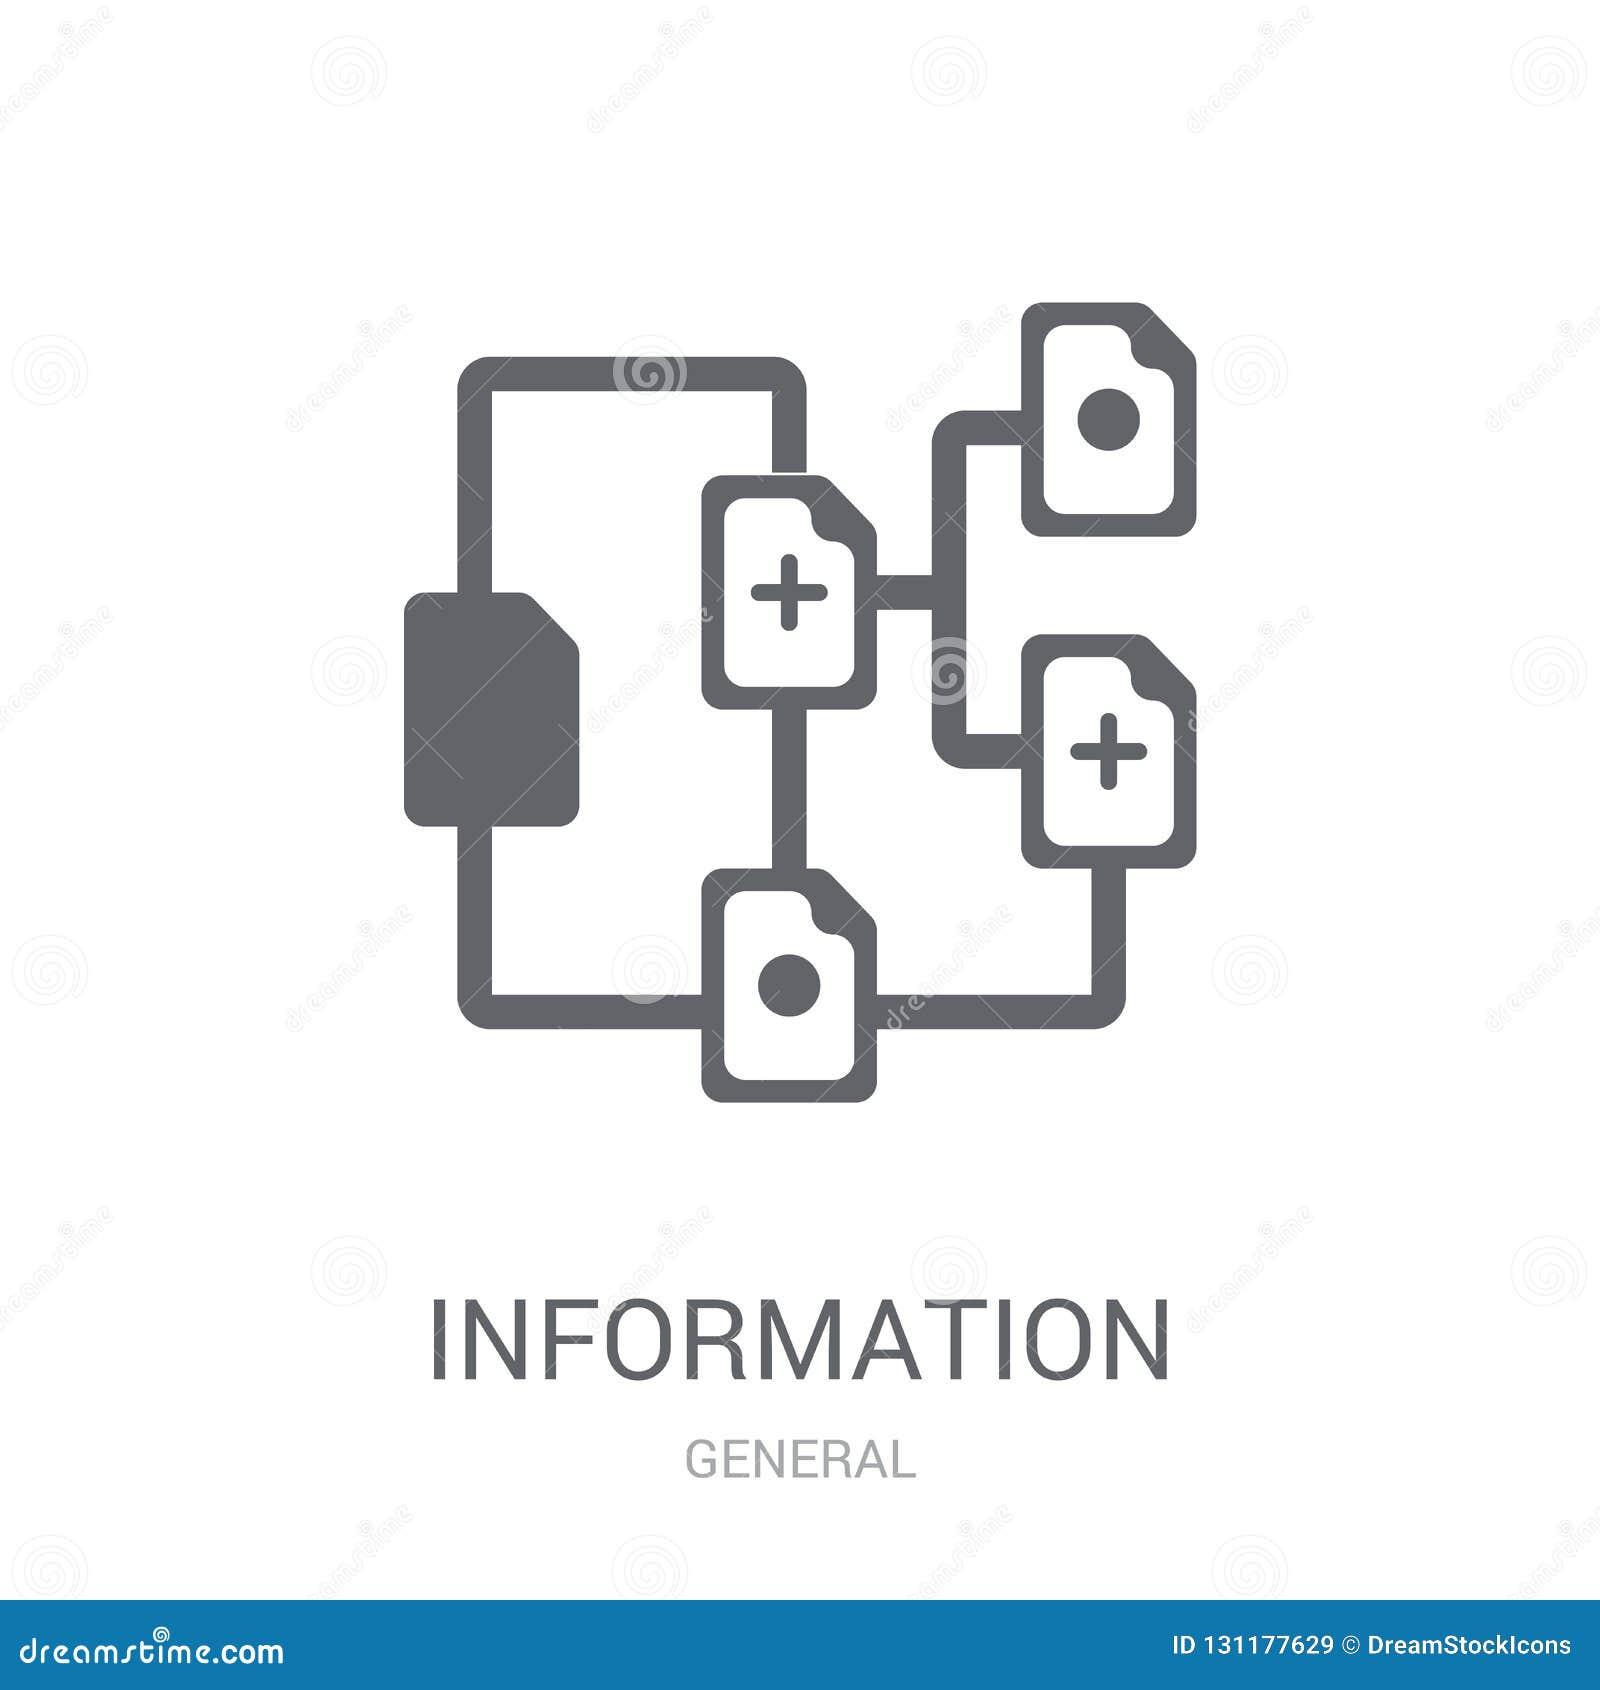 information architecture icon. Trendy information architecture l